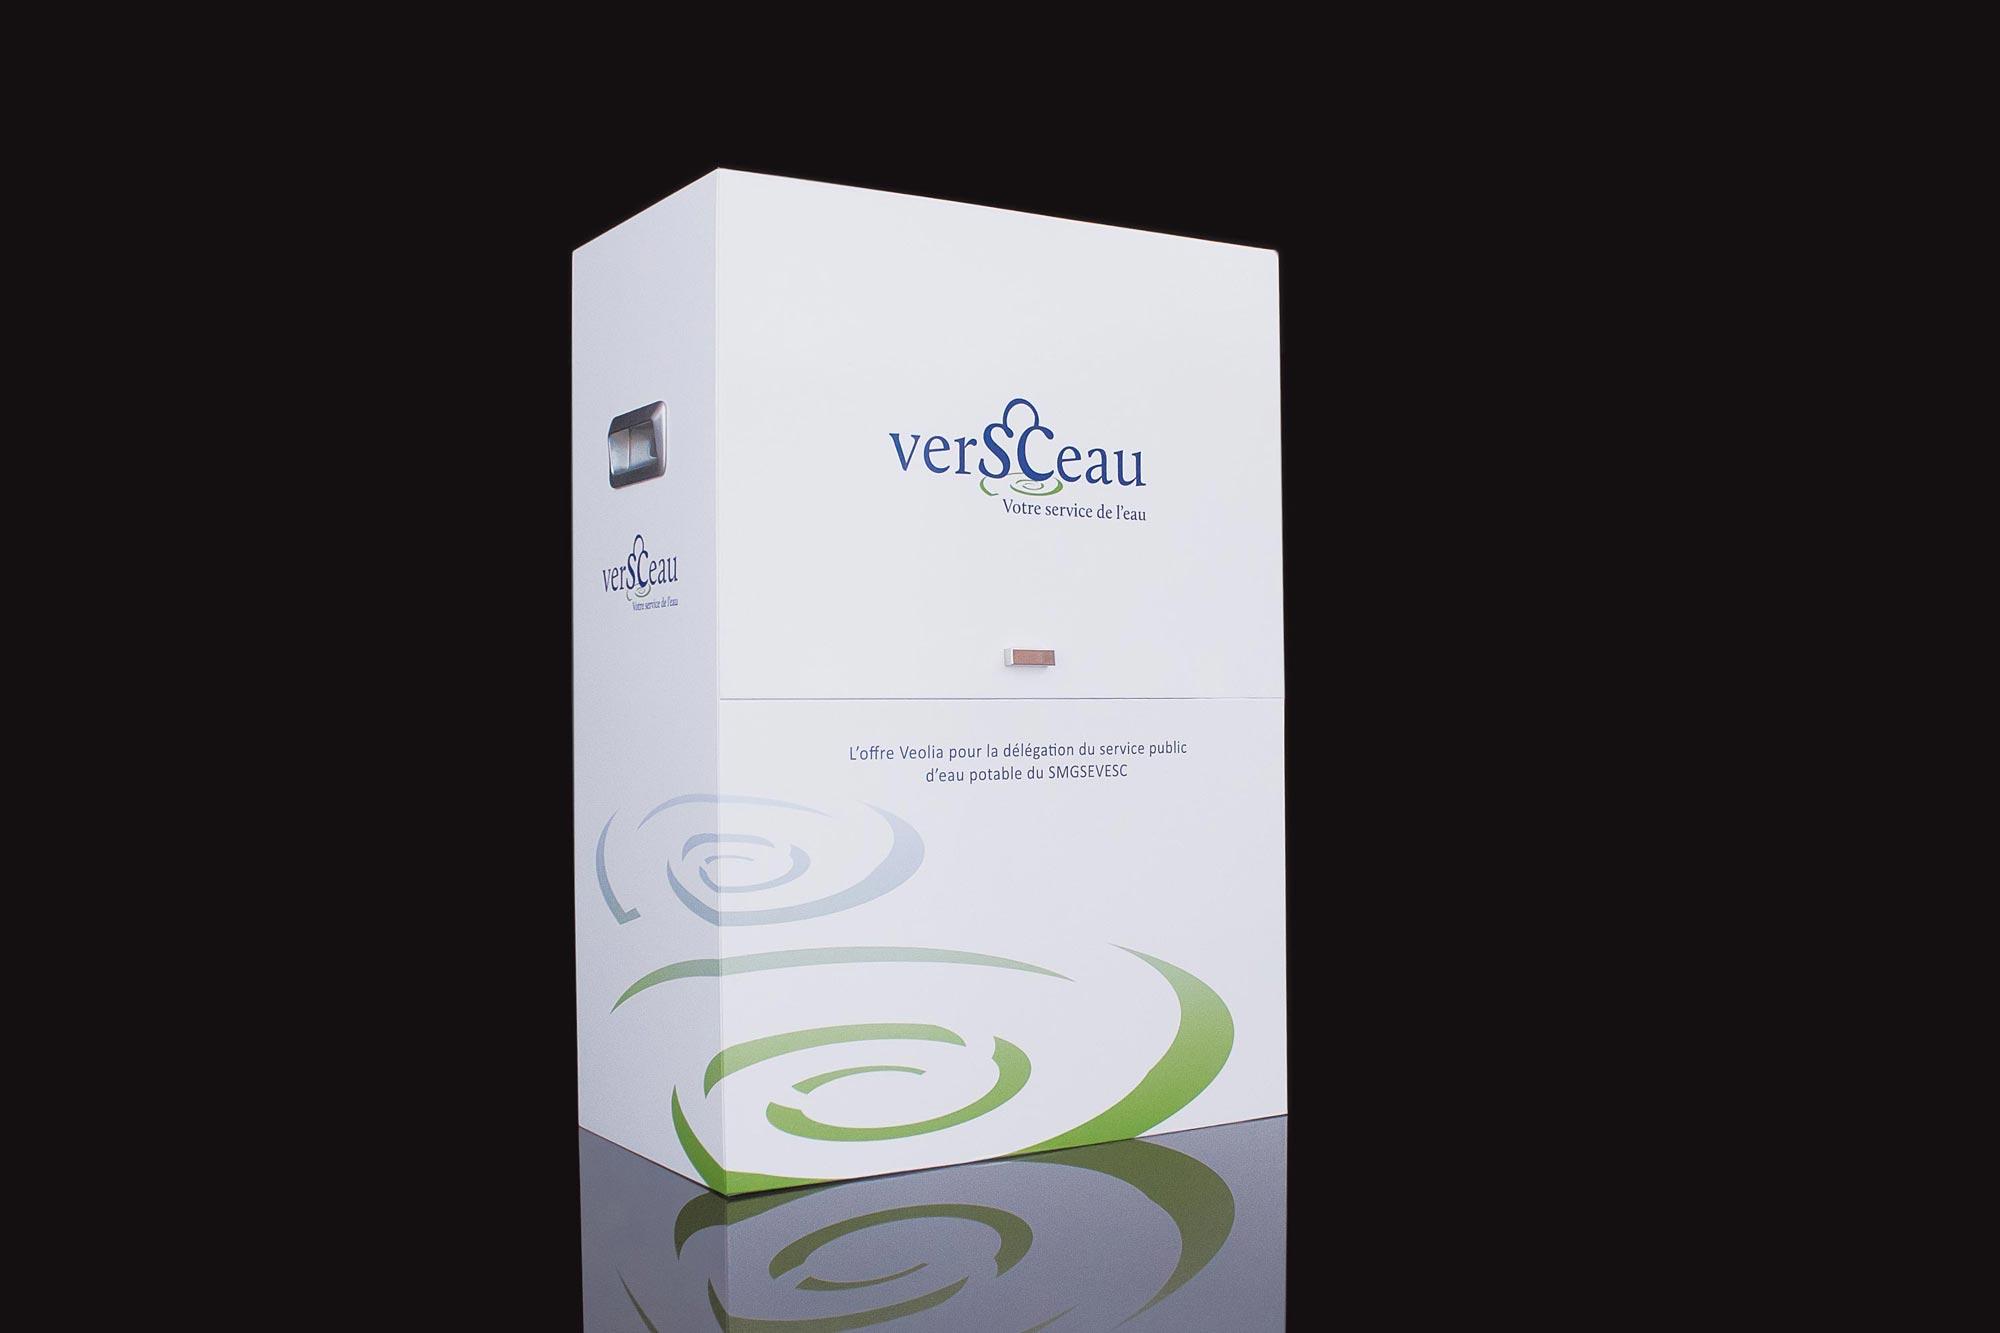 AO-VEOLIA-VERSCEAU4-Coffret-2567.jpg